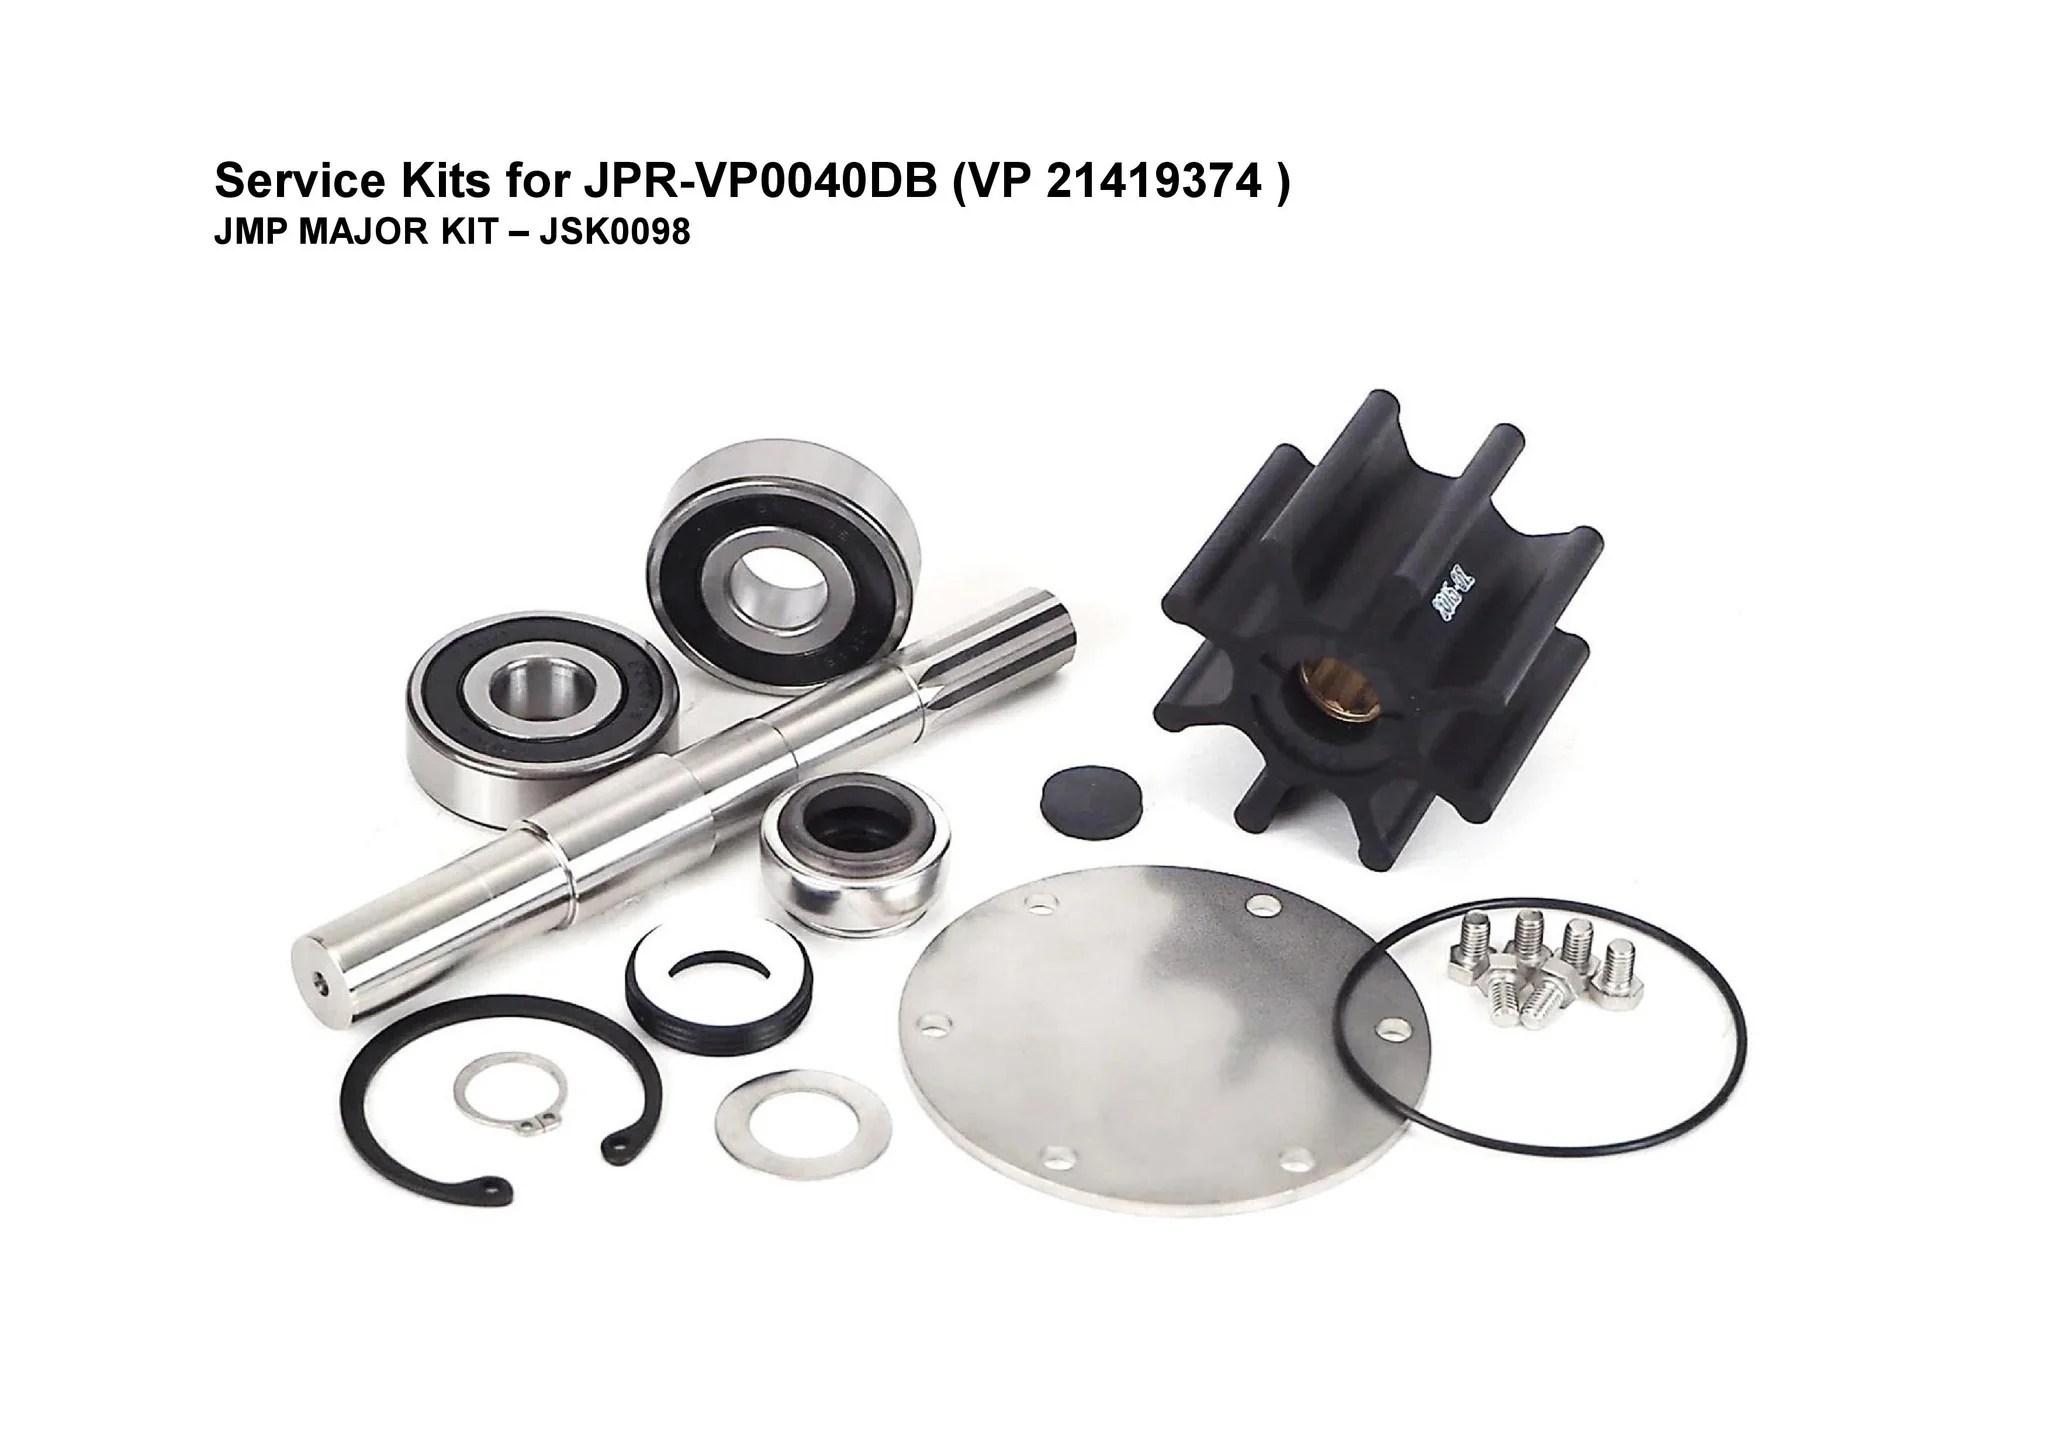 small resolution of jmp jsk0098 major kit for jmp pump jpr vp0040db 21419374 fits volvo penta engines d4 225a e d4 260a e d4 260d e d4 300a e d4 300d e